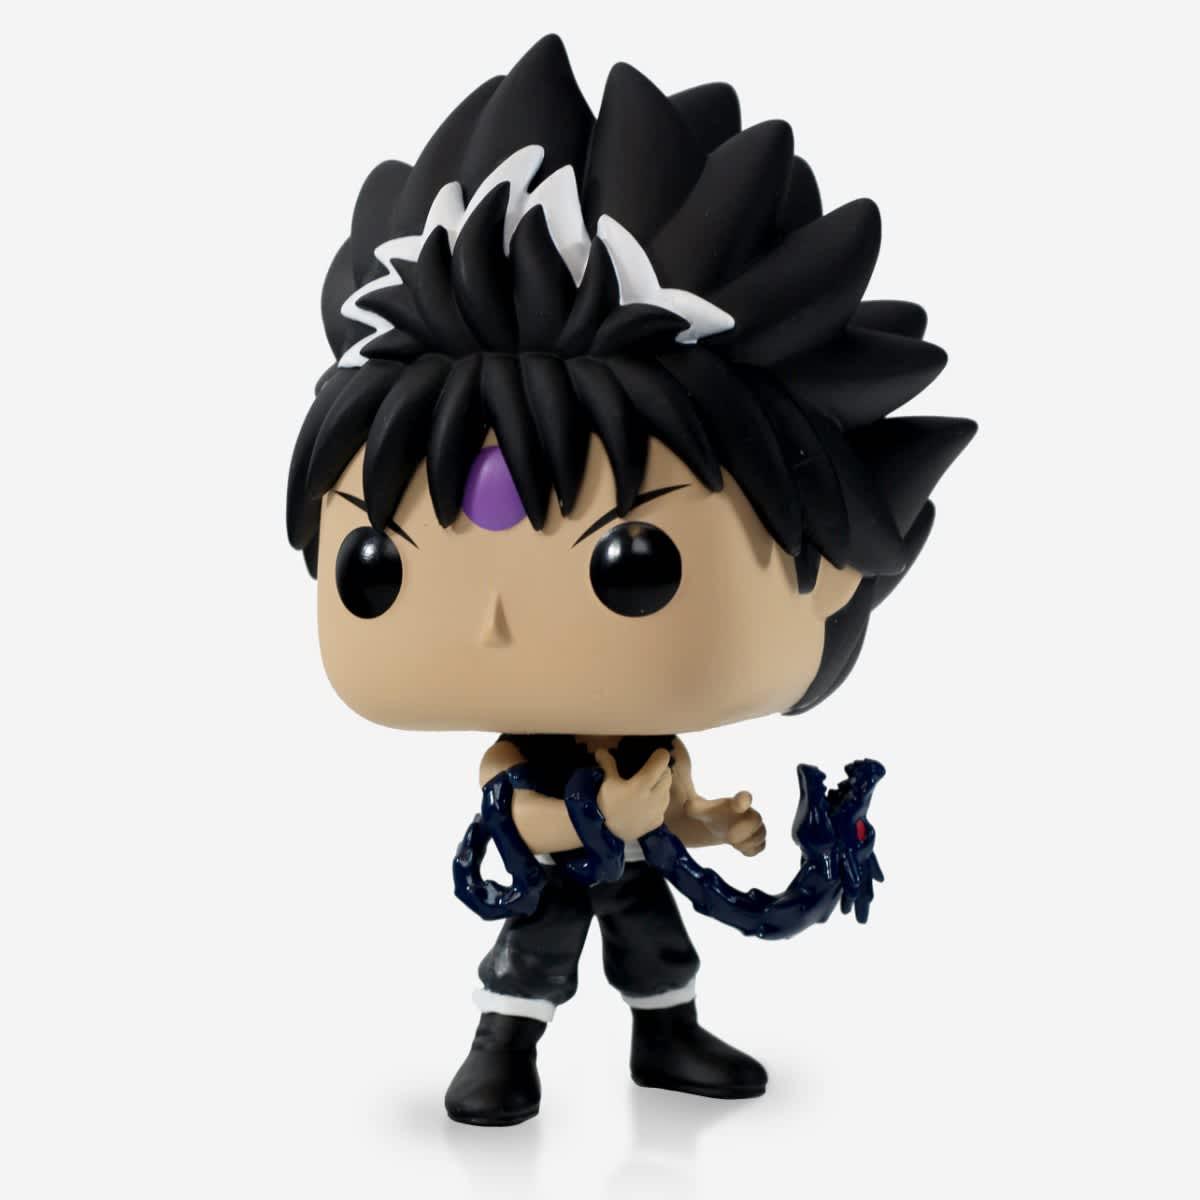 Anime Figures & Collectibles - Shop Funko Pop Figures Online